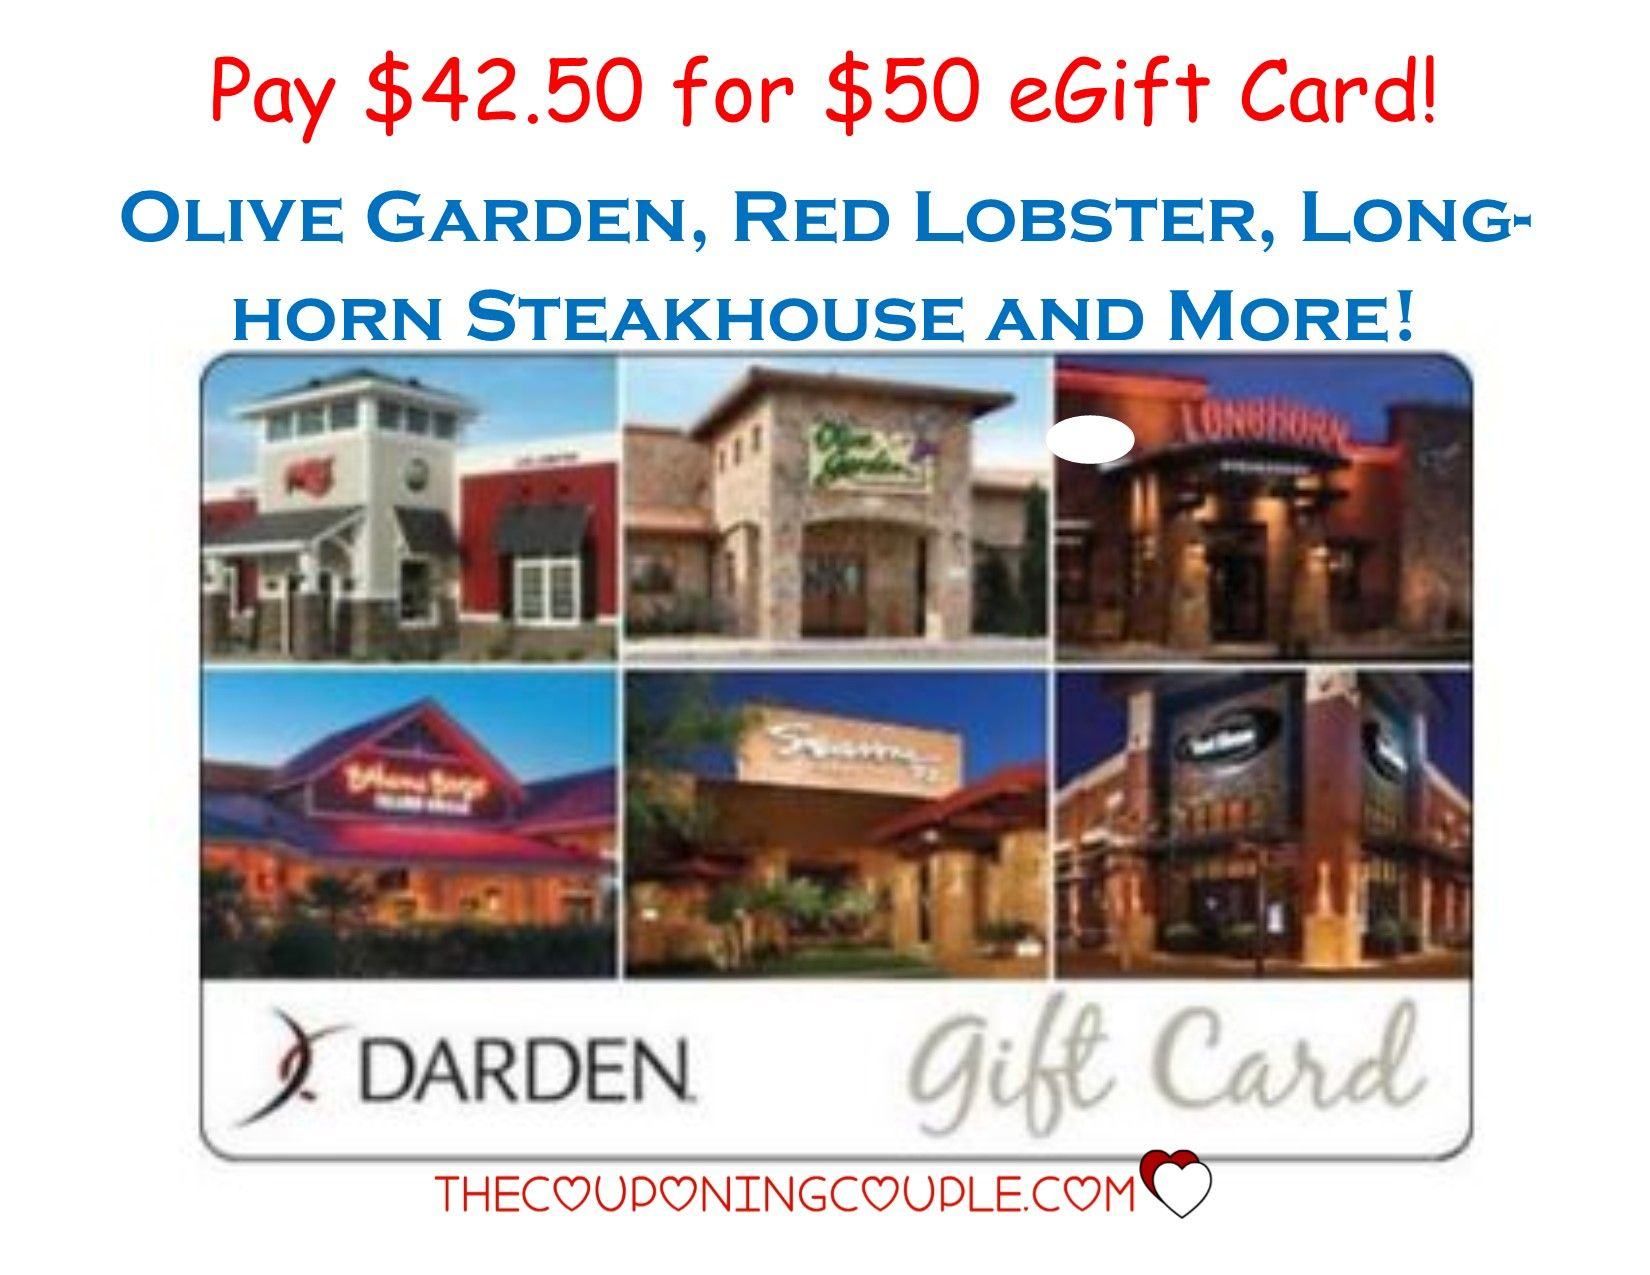 50 darden egift card for 4250 olive garden red